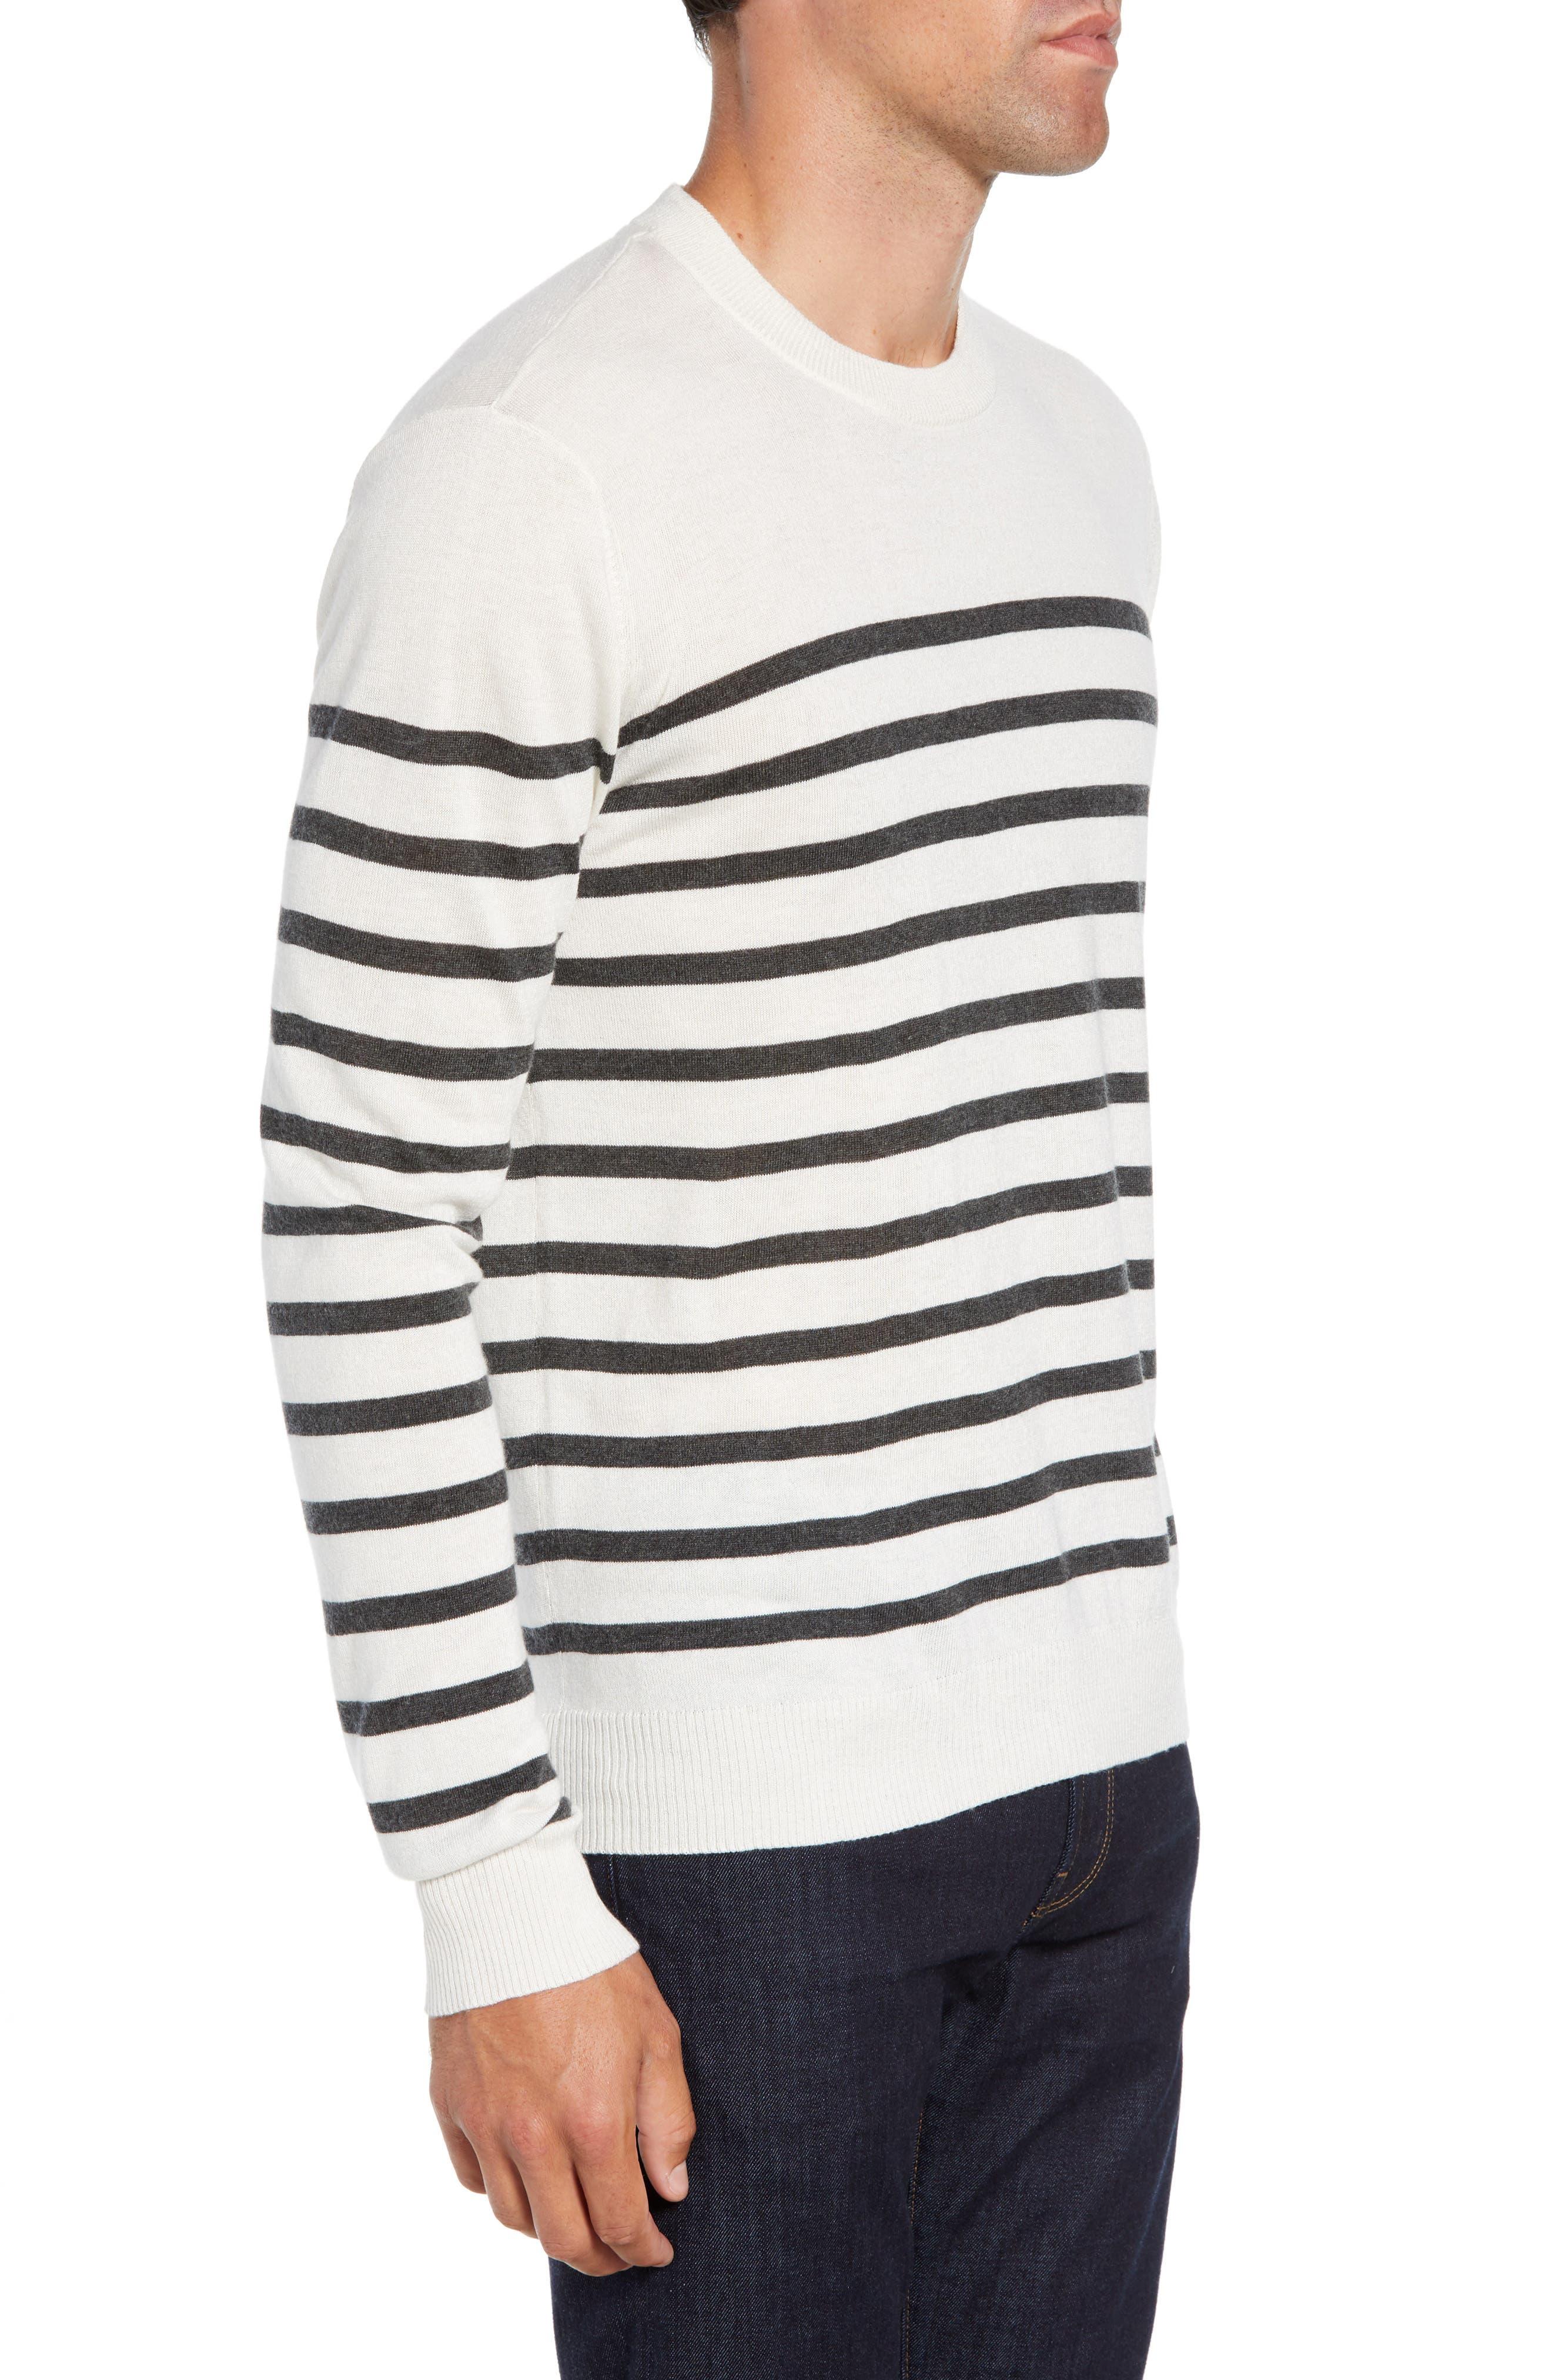 ATM ANTHONY THOMAS MELILLO,                             Sailor Stripe Silk Blend Sweater,                             Alternate thumbnail 3, color,                             CHALK/ CHARCOAL COMBO